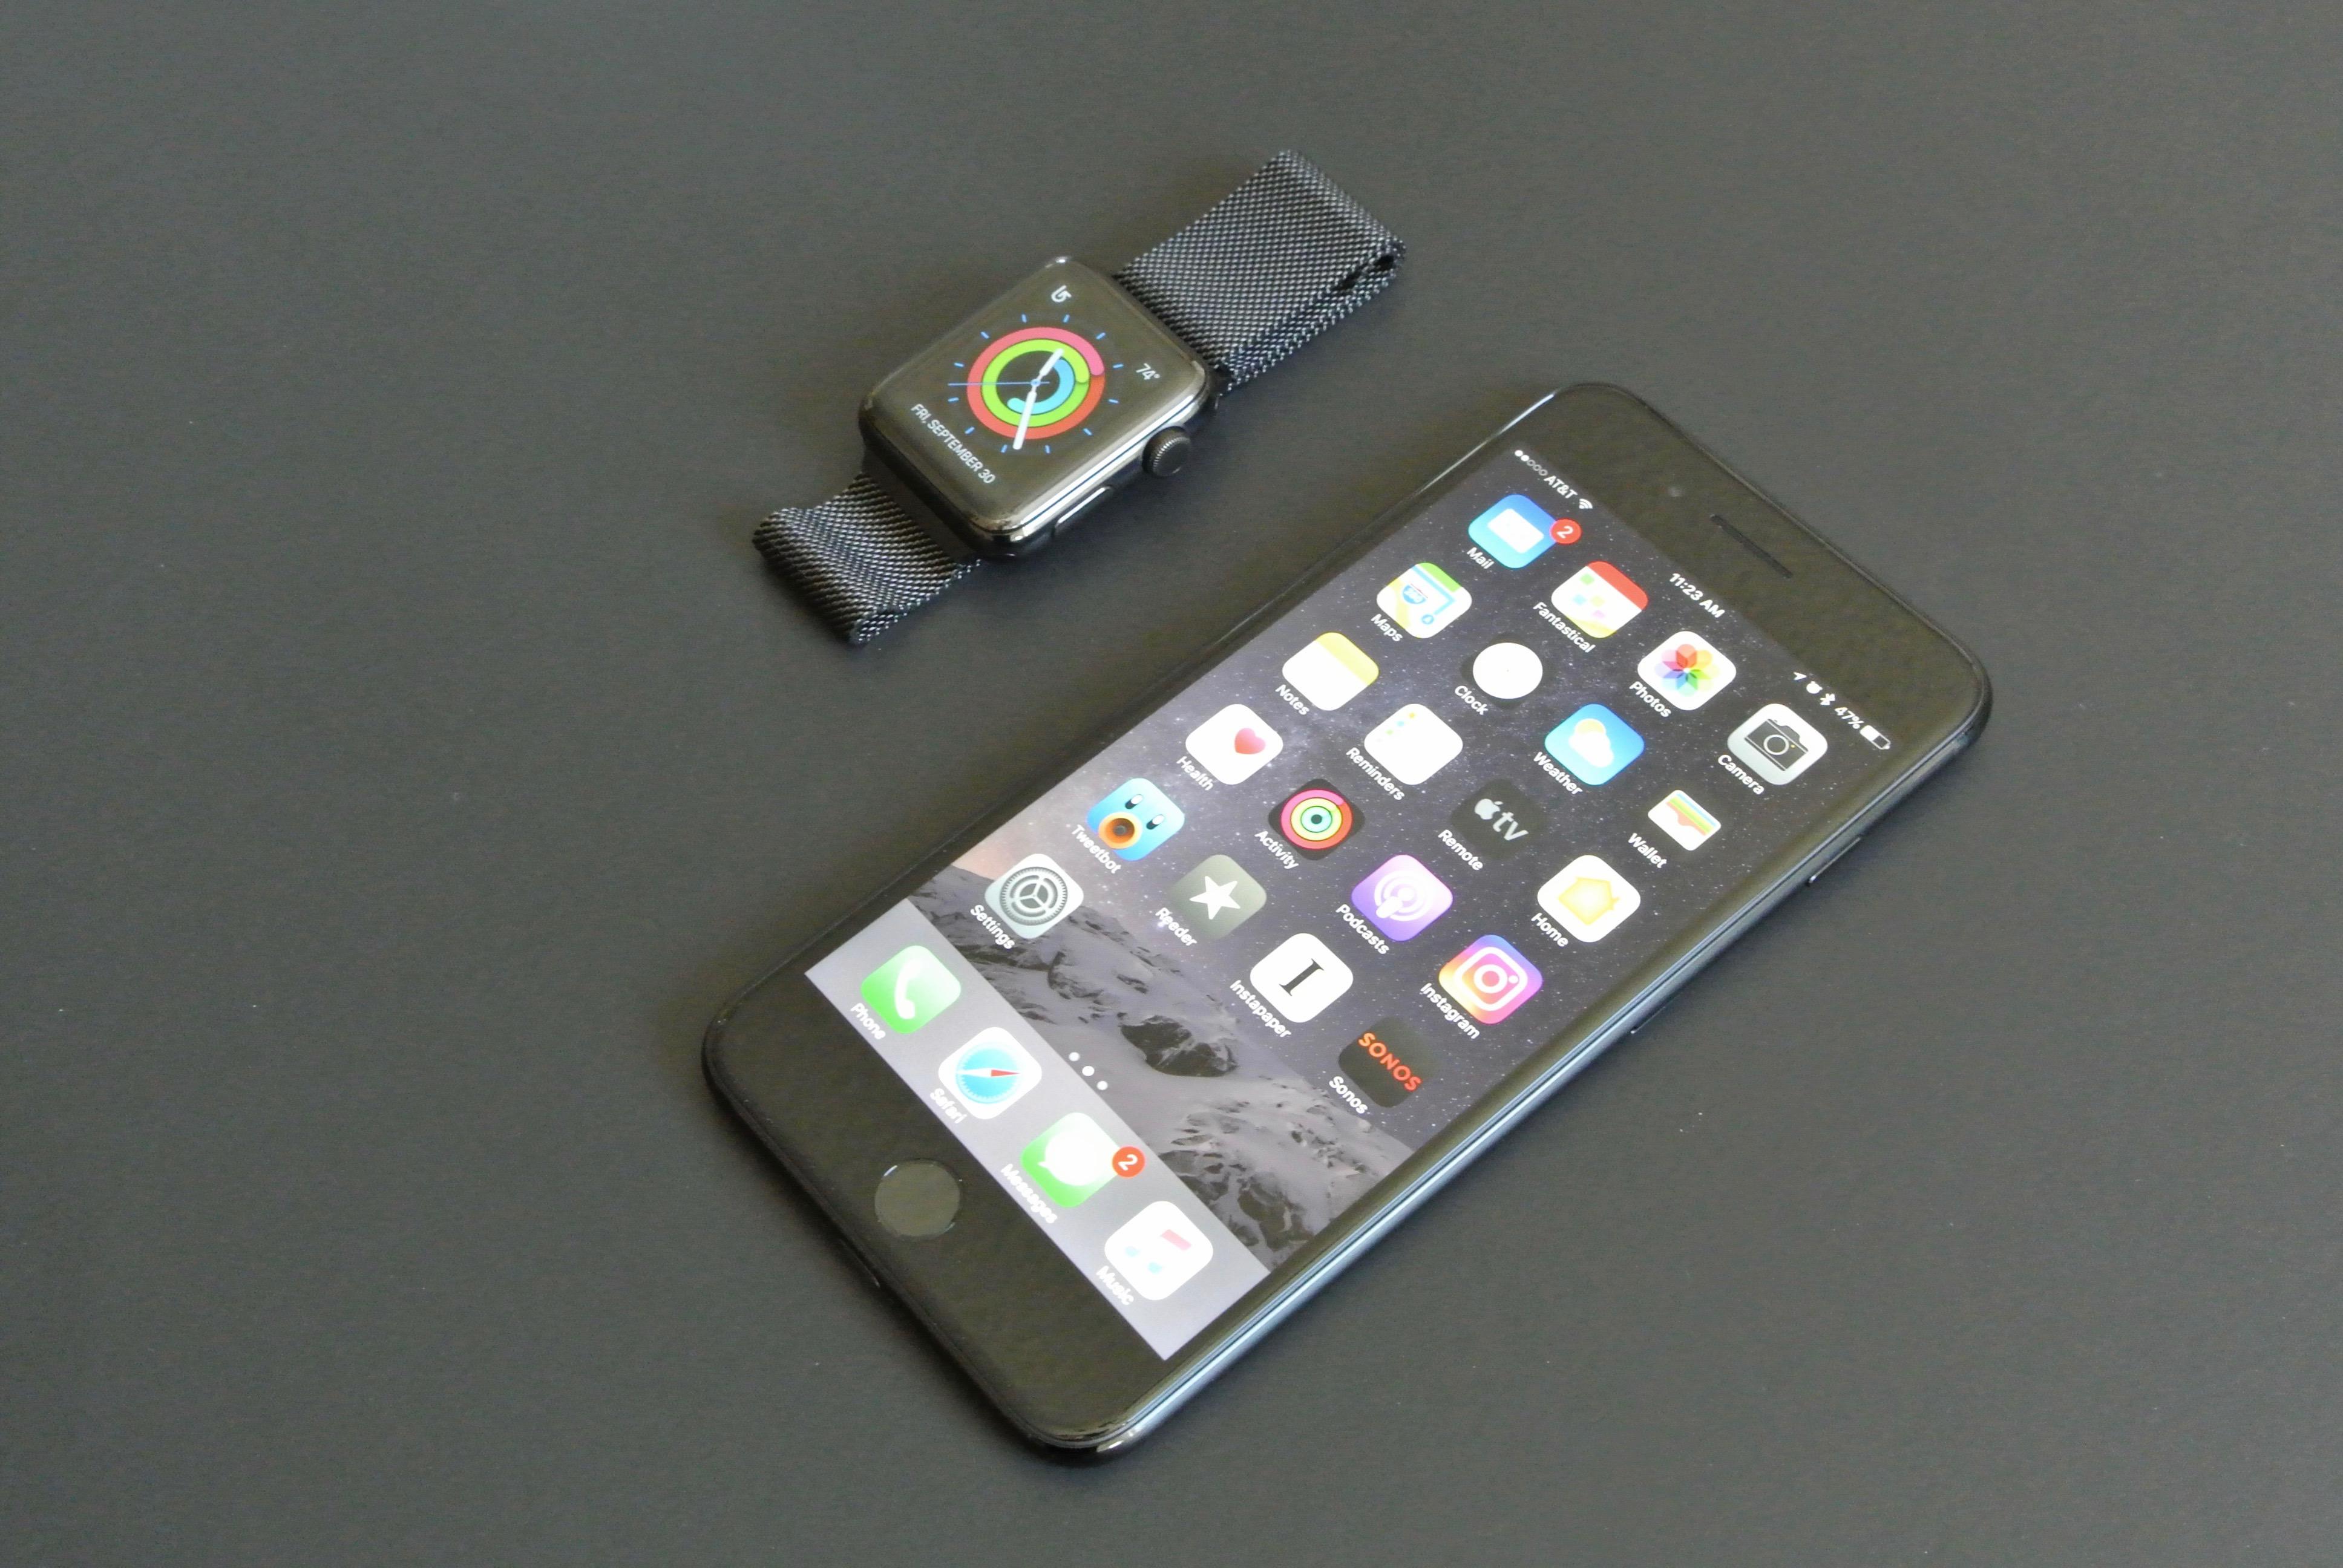 iPhone 7 jet black vs apple watch space black 5